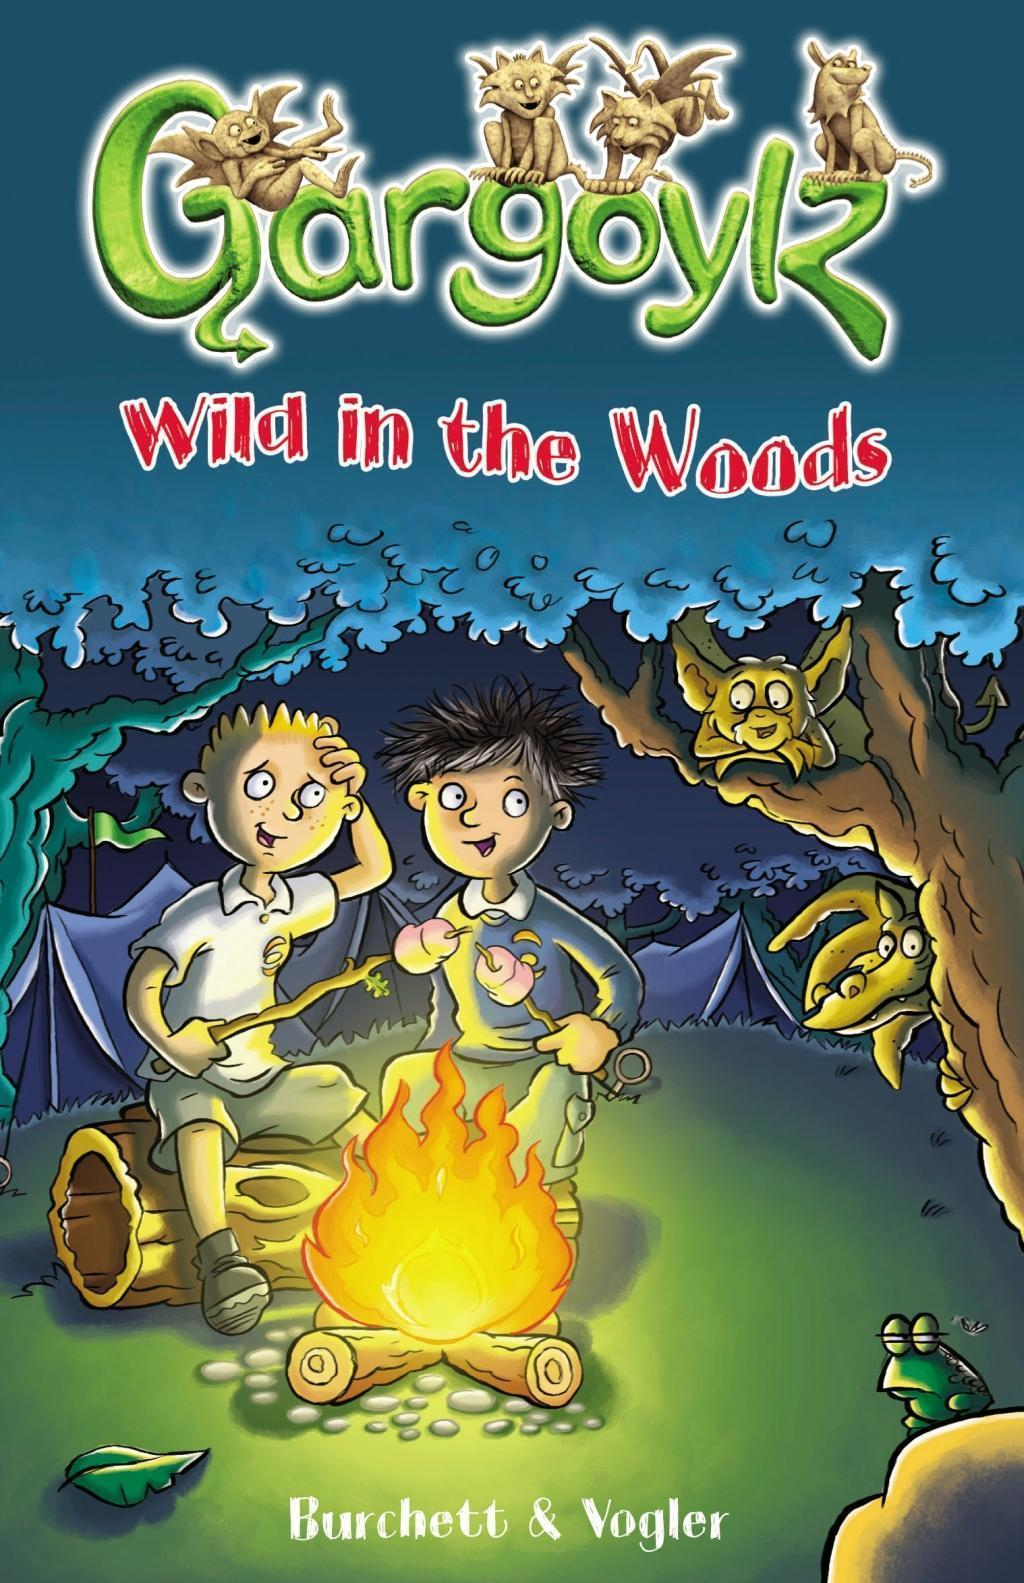 Gargoylz: Wild in the Woods